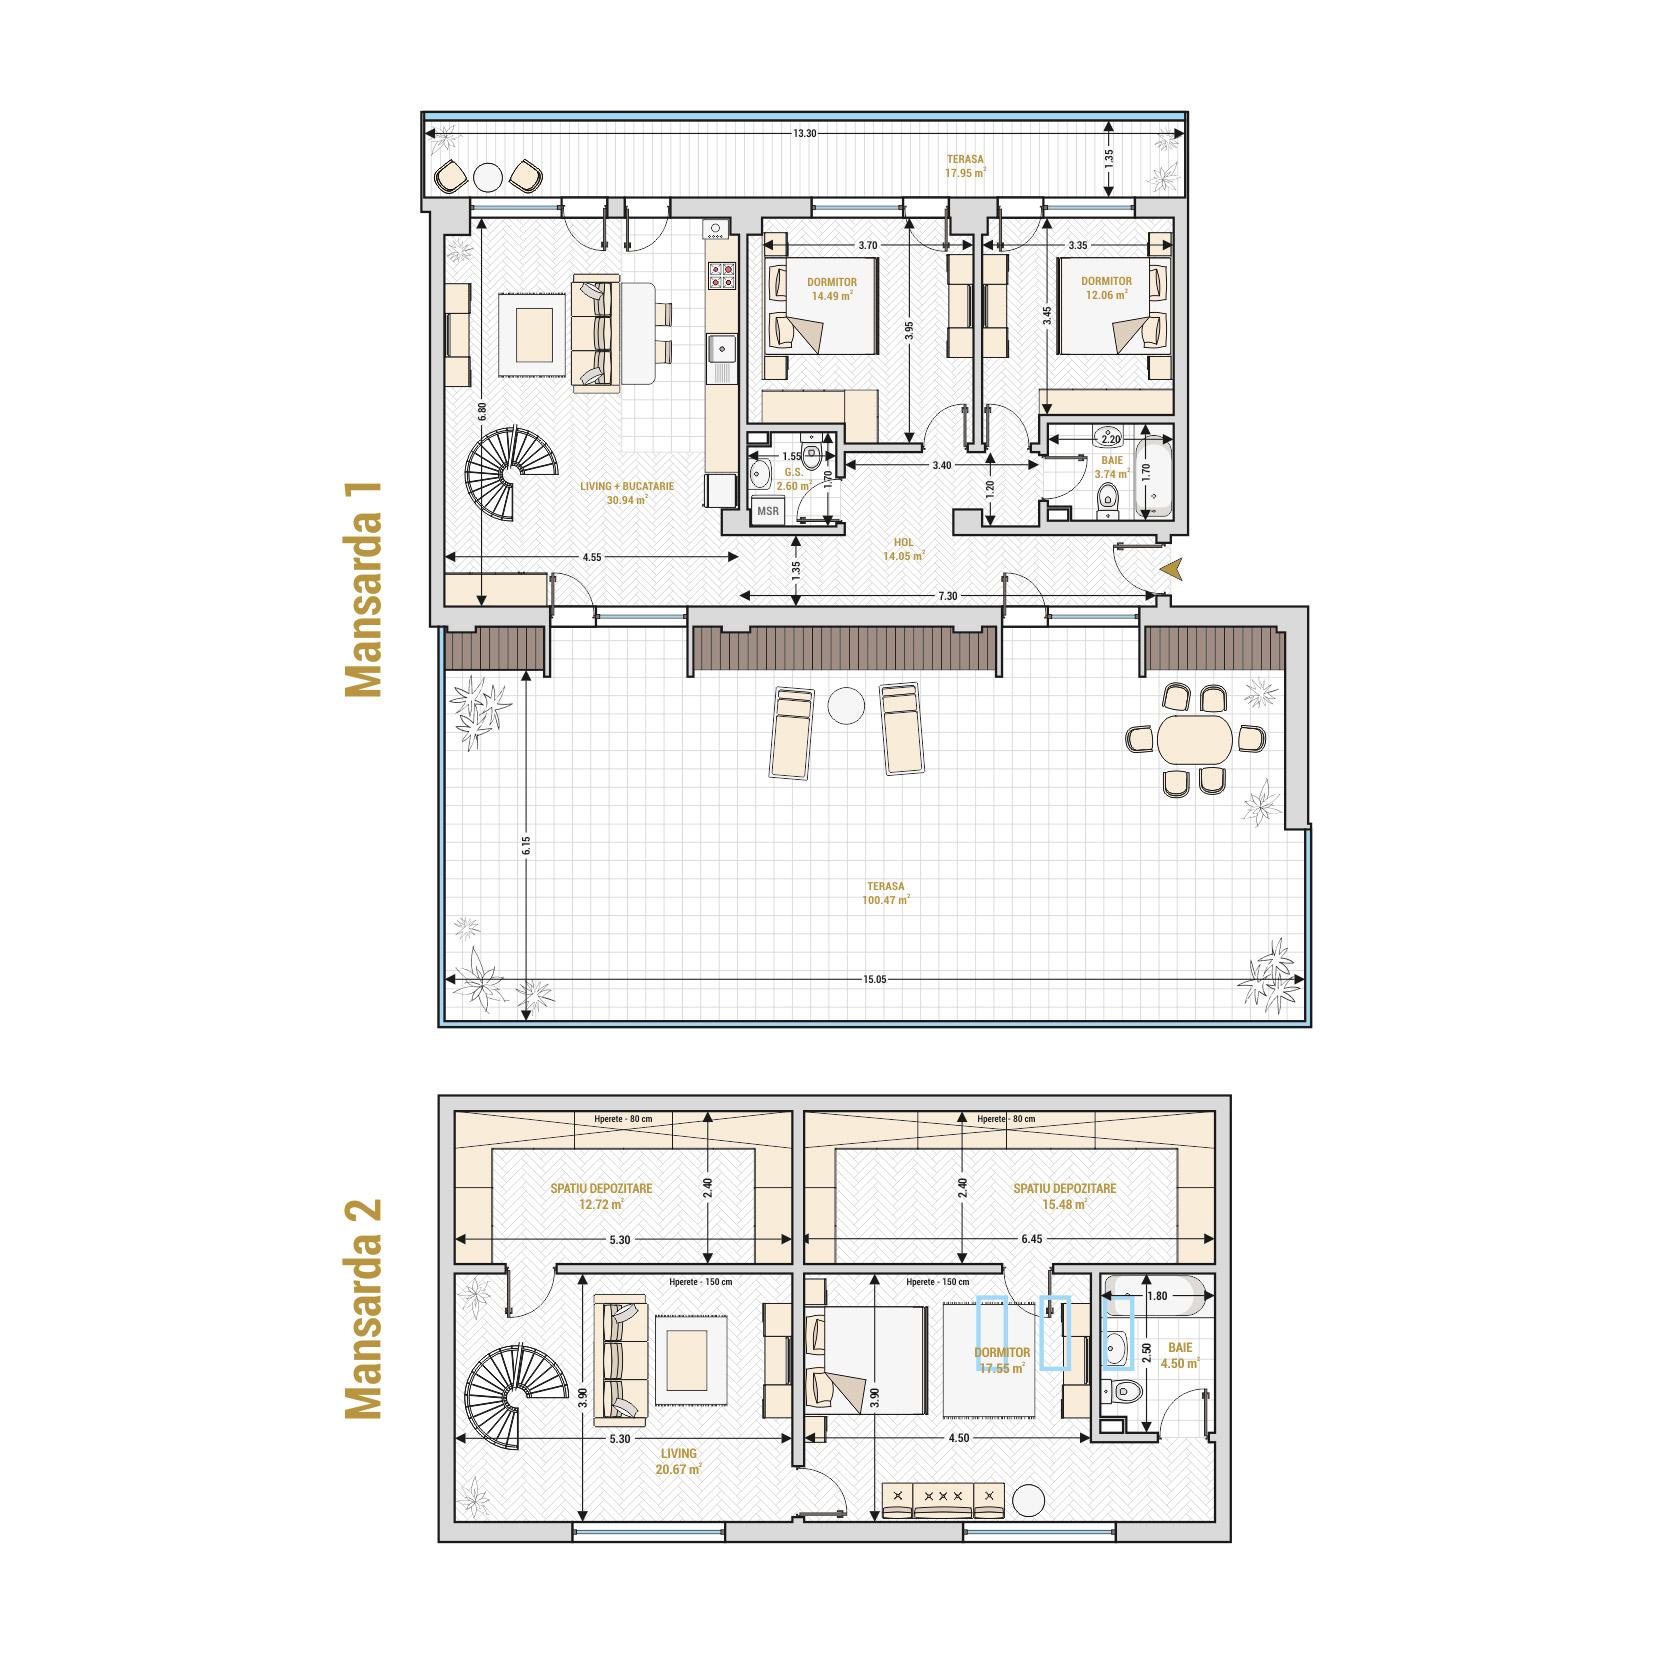 Duplex 5 camere de vanzare Bucuresti - Catedral Residence - Marriott, Piata Unirii, 13 Septembrie, Izvor - Tip 2 - T2A